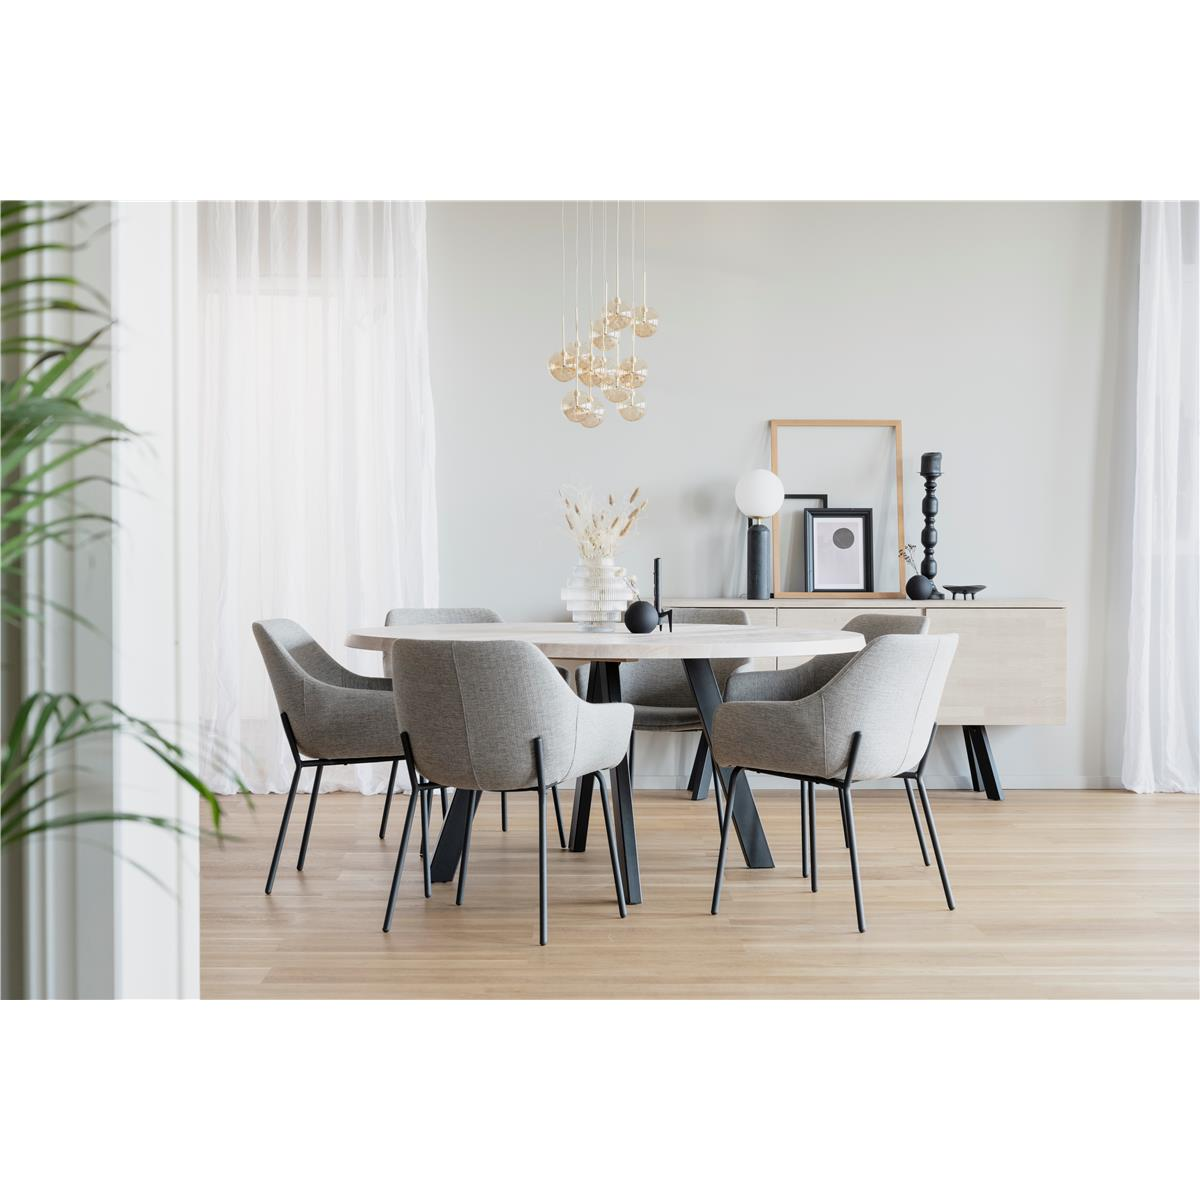 Fred-matbord-Vitpigmenterad-svart 117442 2